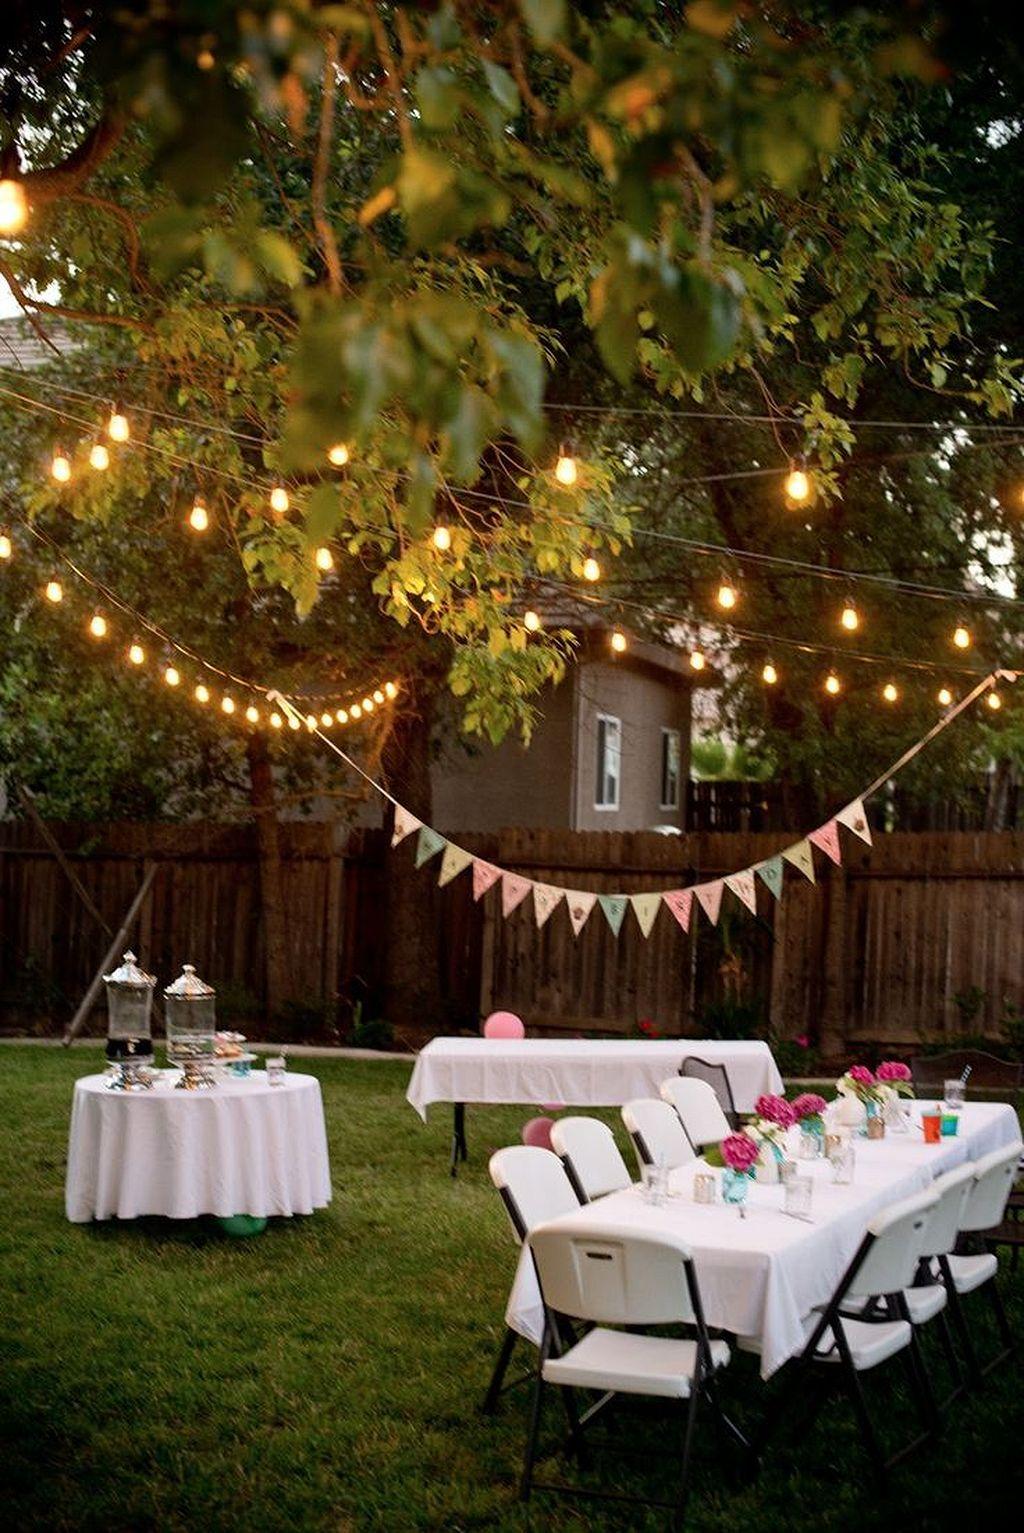 40+ Summer Engagement Party at Backyard | Backyard weddings ...